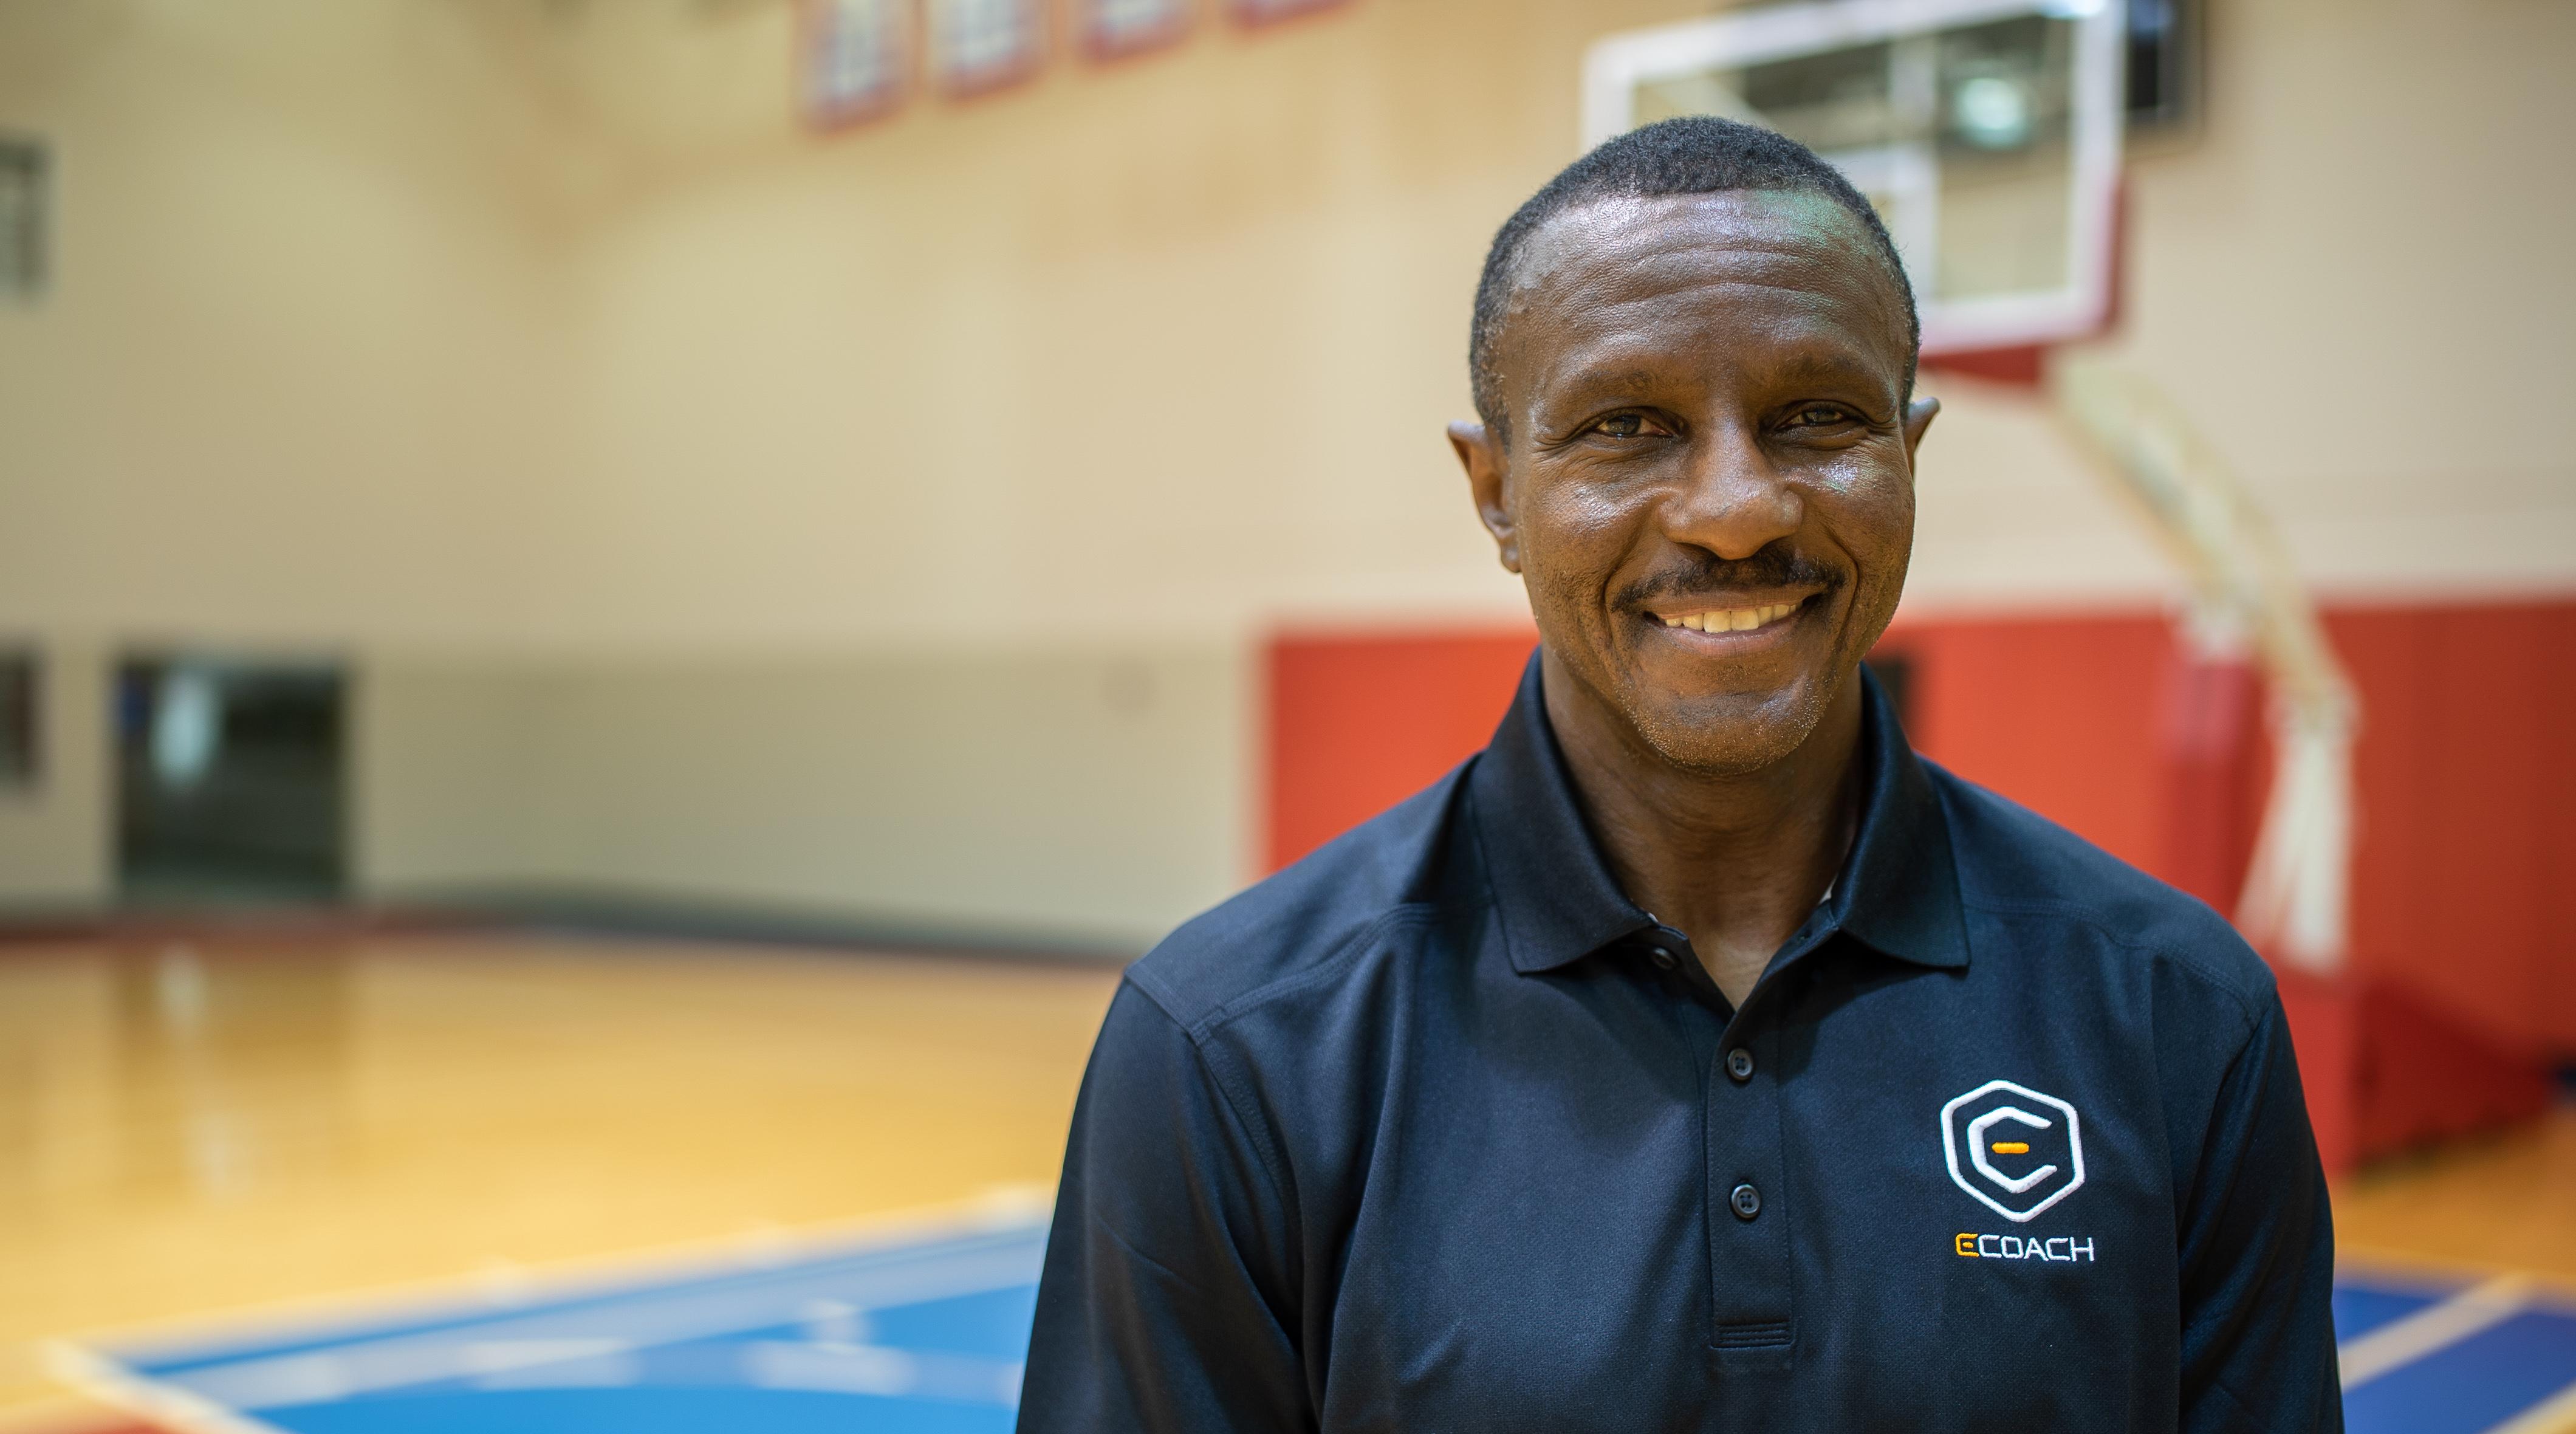 Dwane Casey NBA Coach Detroit Pistons